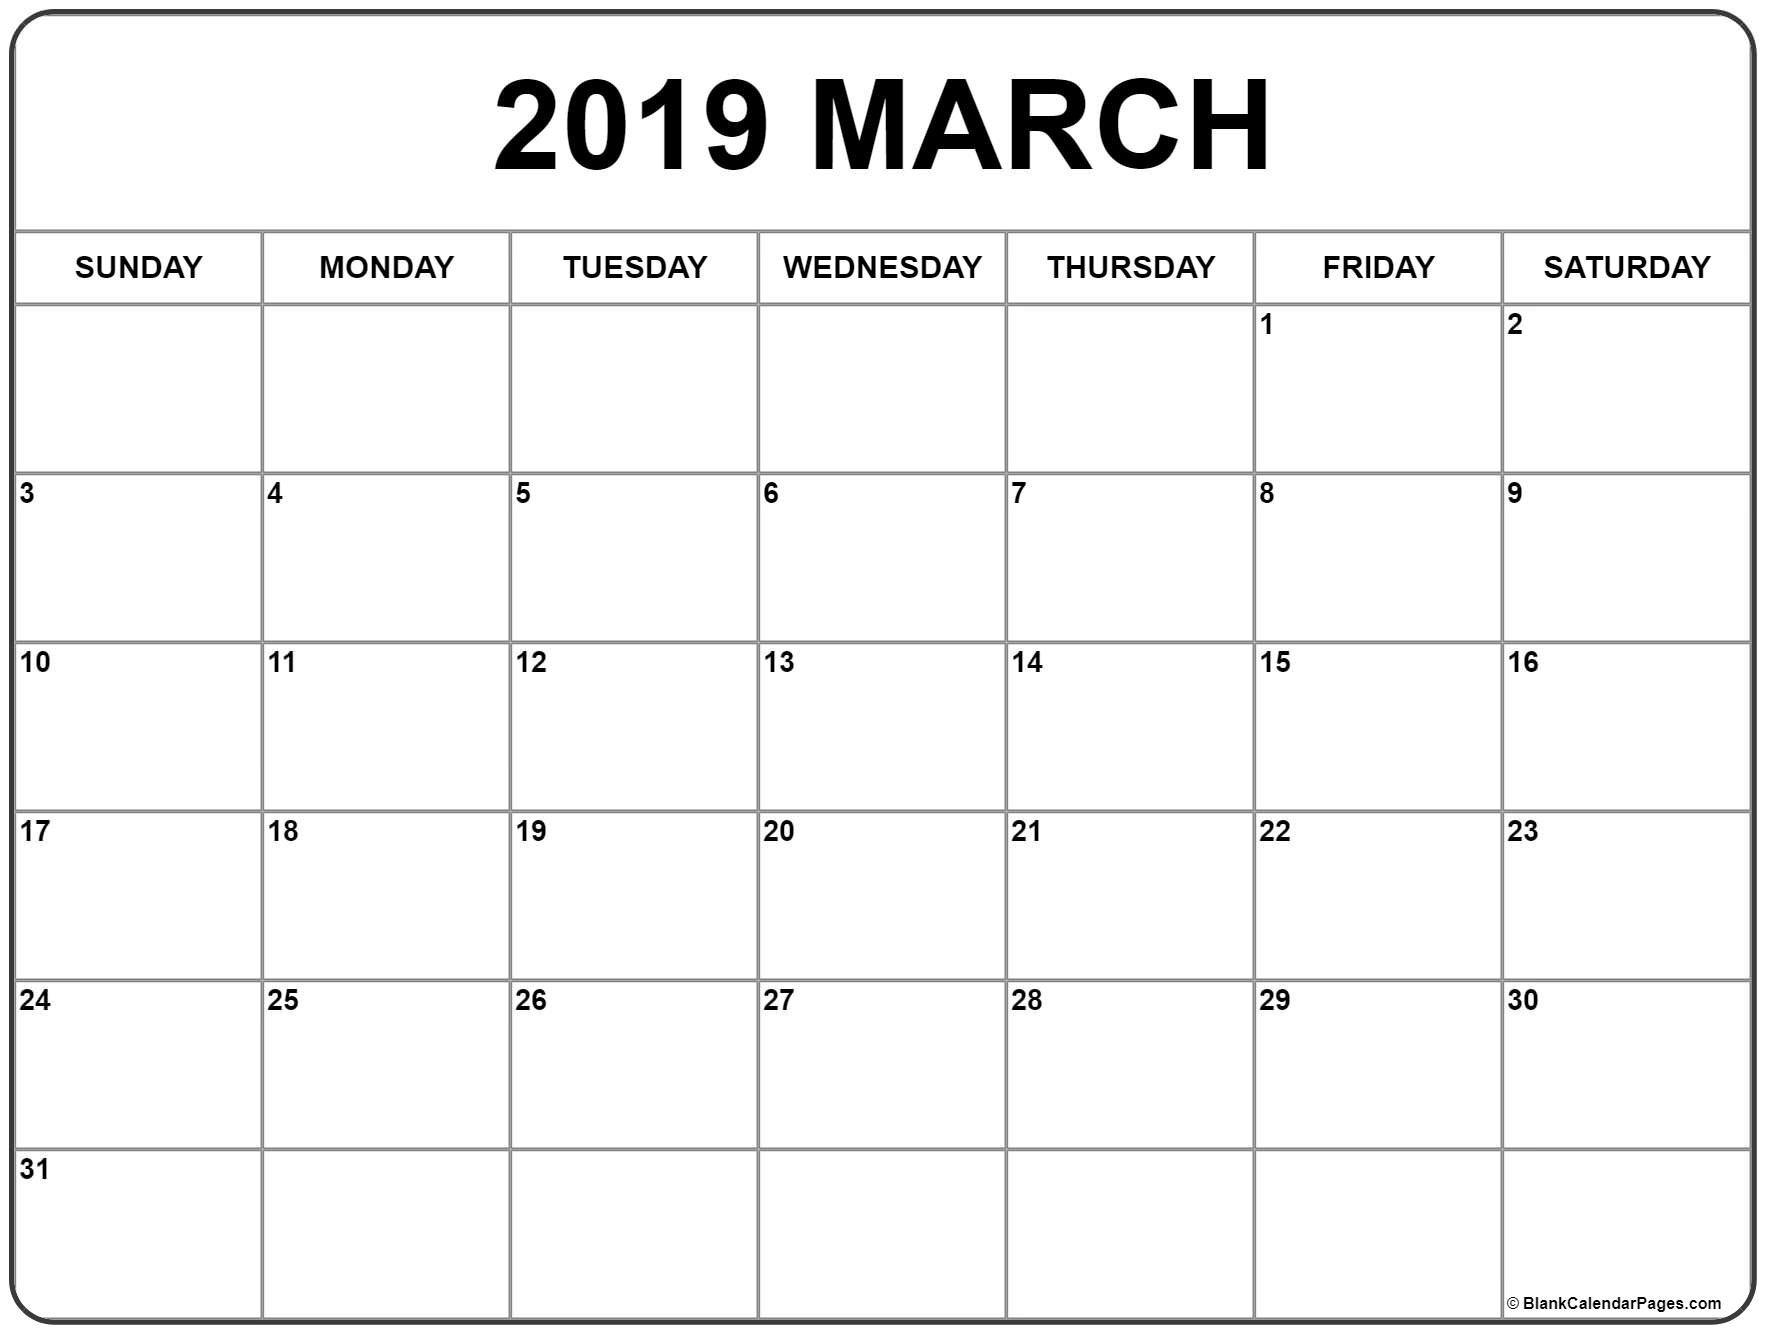 March 2019 Calendar   56+ Templates Of 2019 Printable Calendars Calendar 2019 Print Free